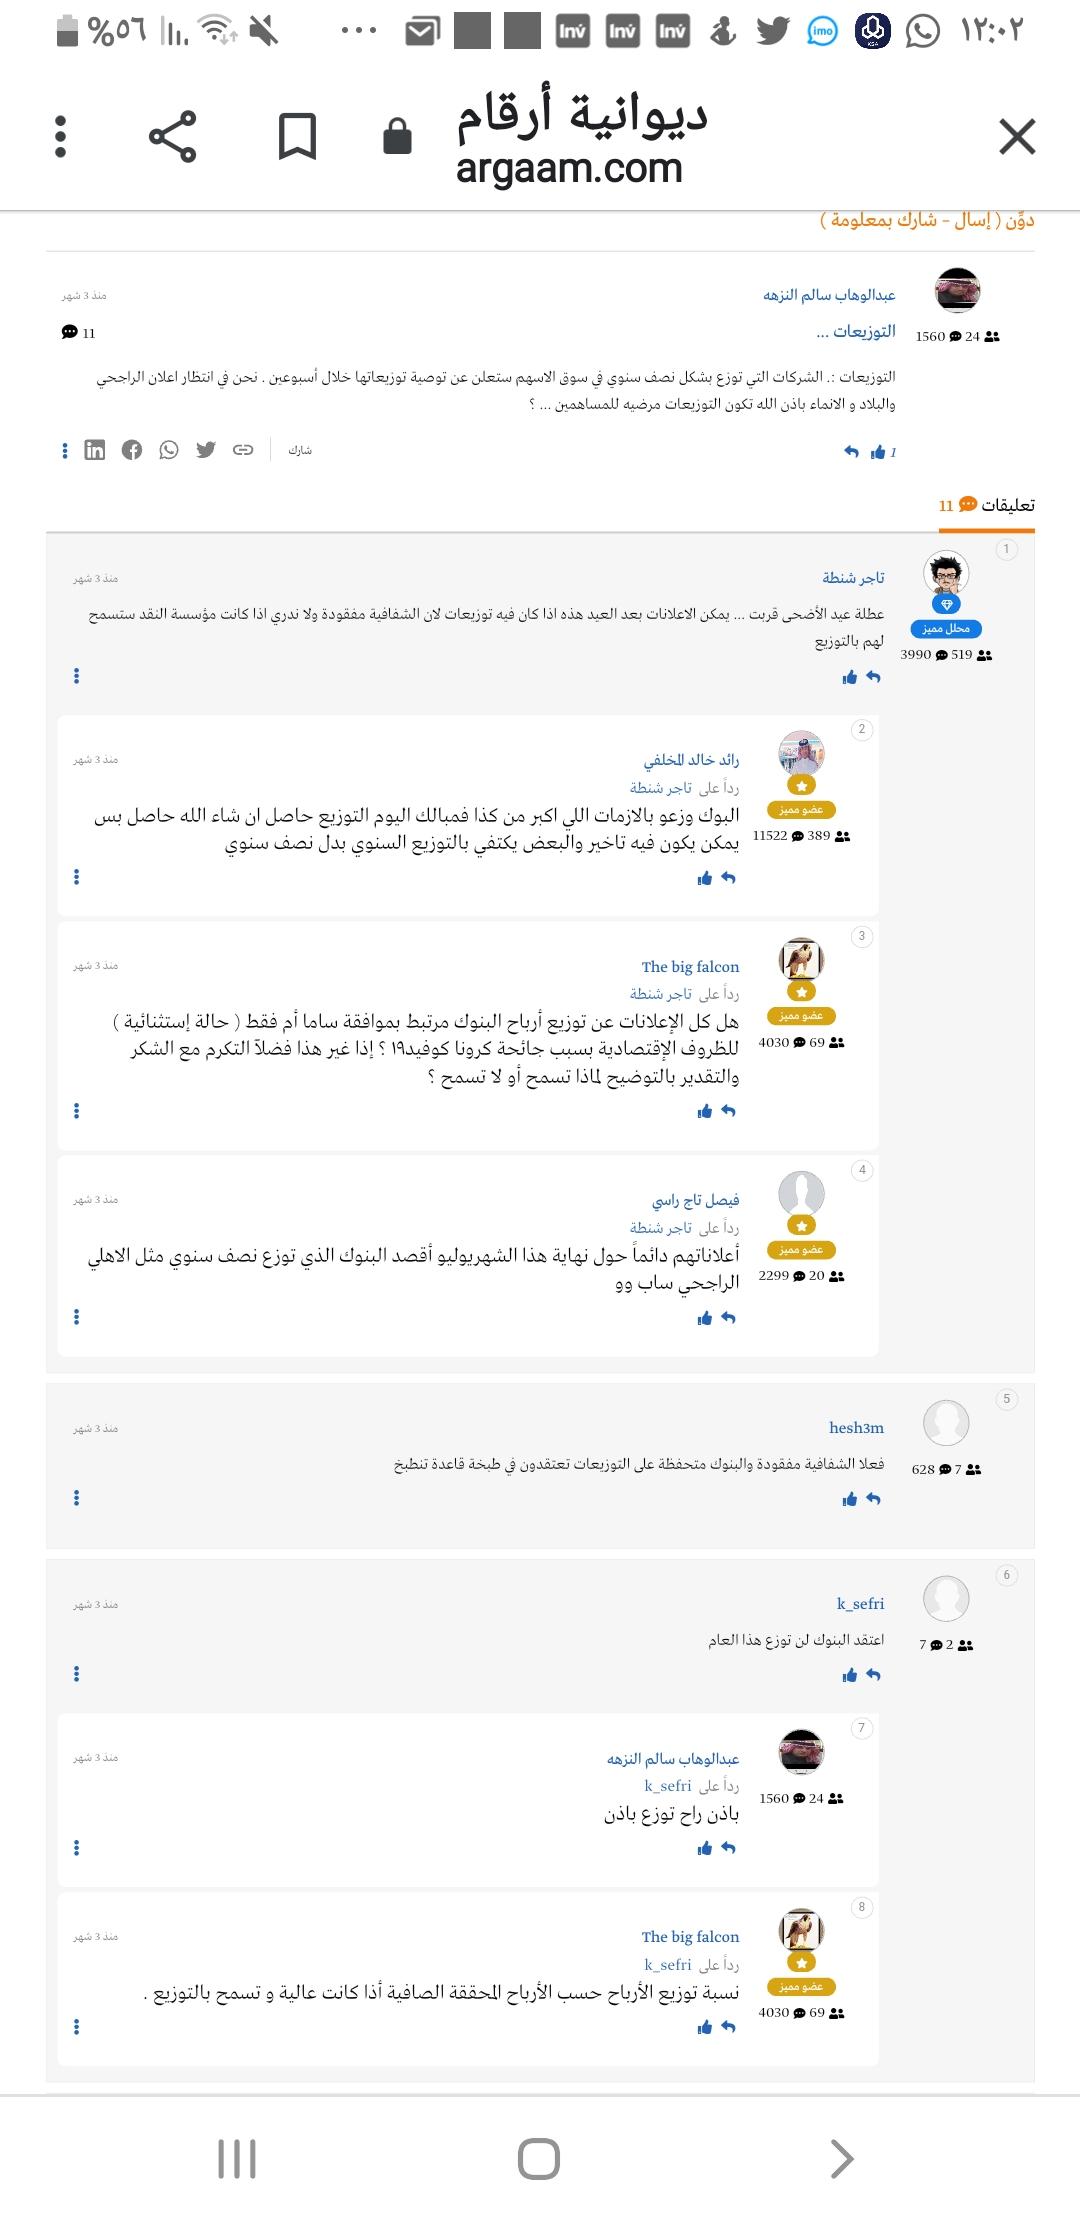 نادلة صلى الانحراف شنطه ميفك - ledergerber-treuhand.com